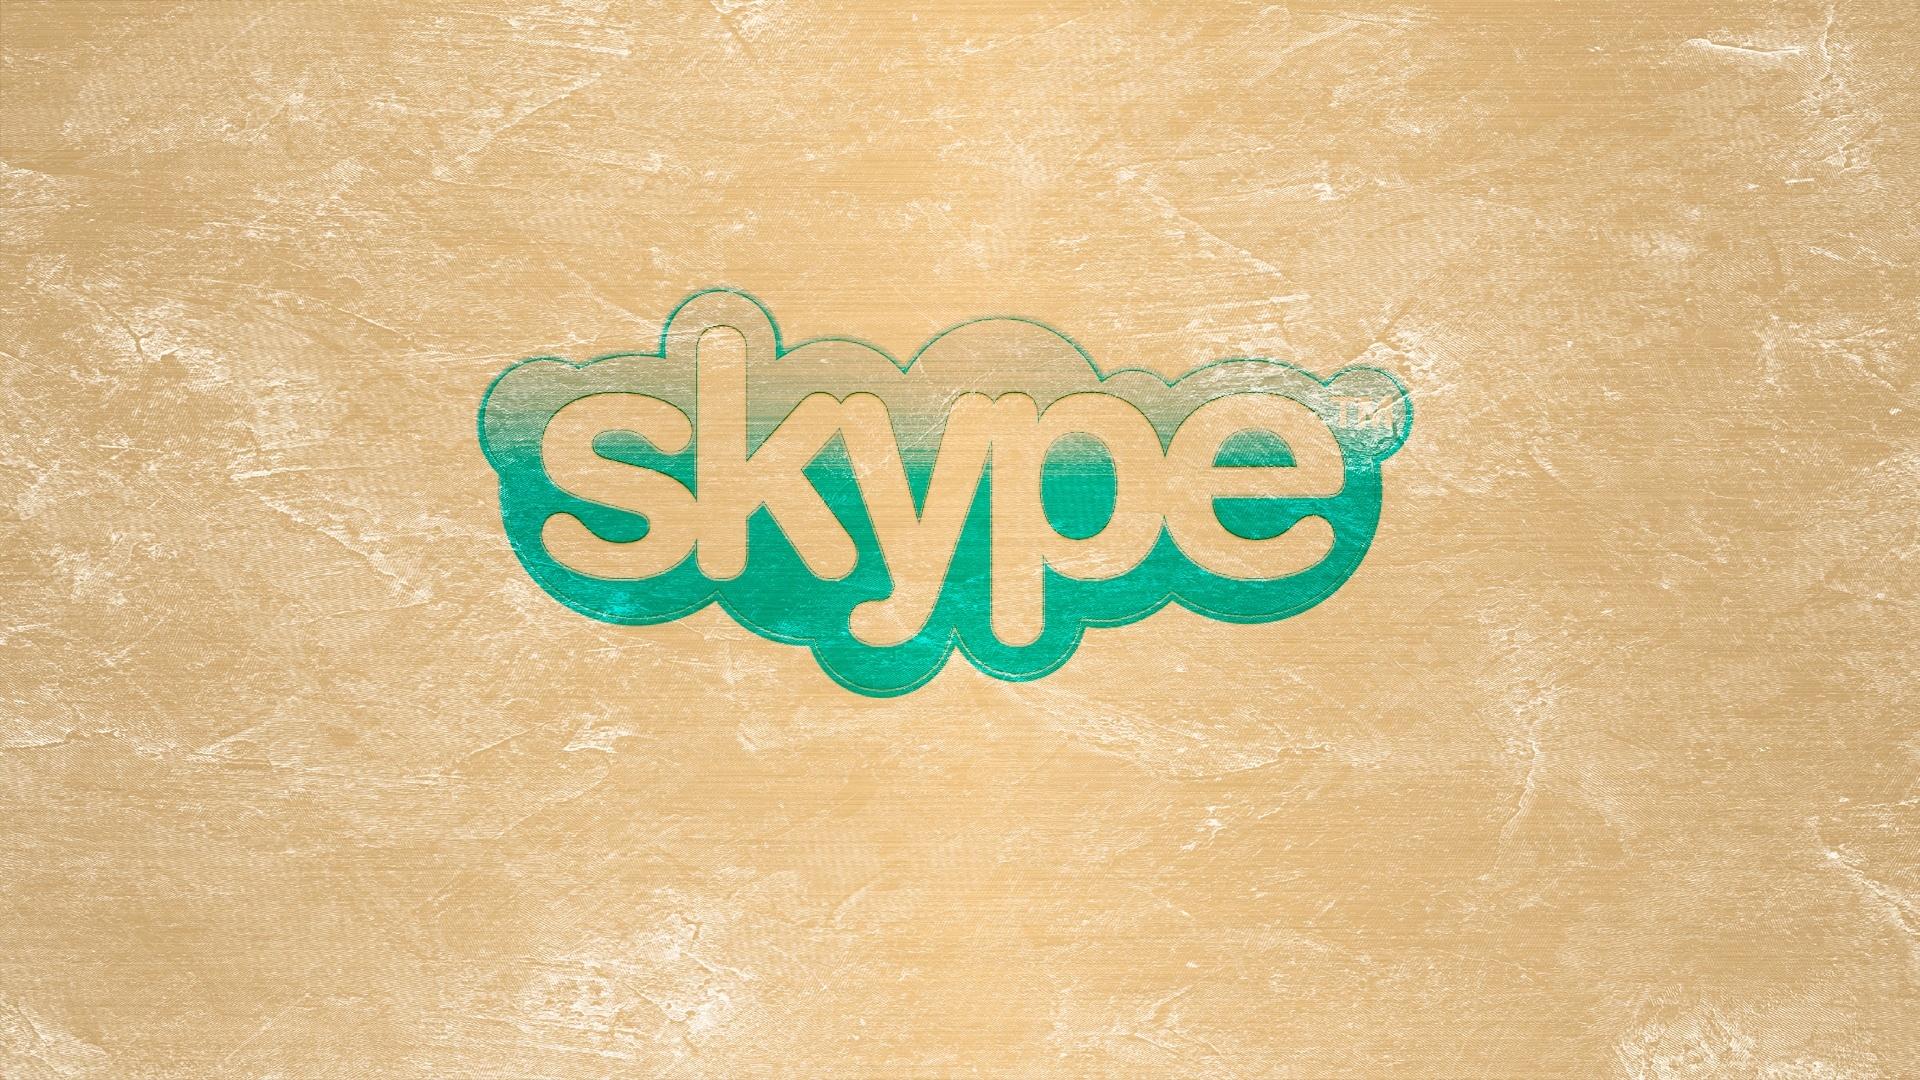 Skype permite de acum multitasking pe telefoanele Android